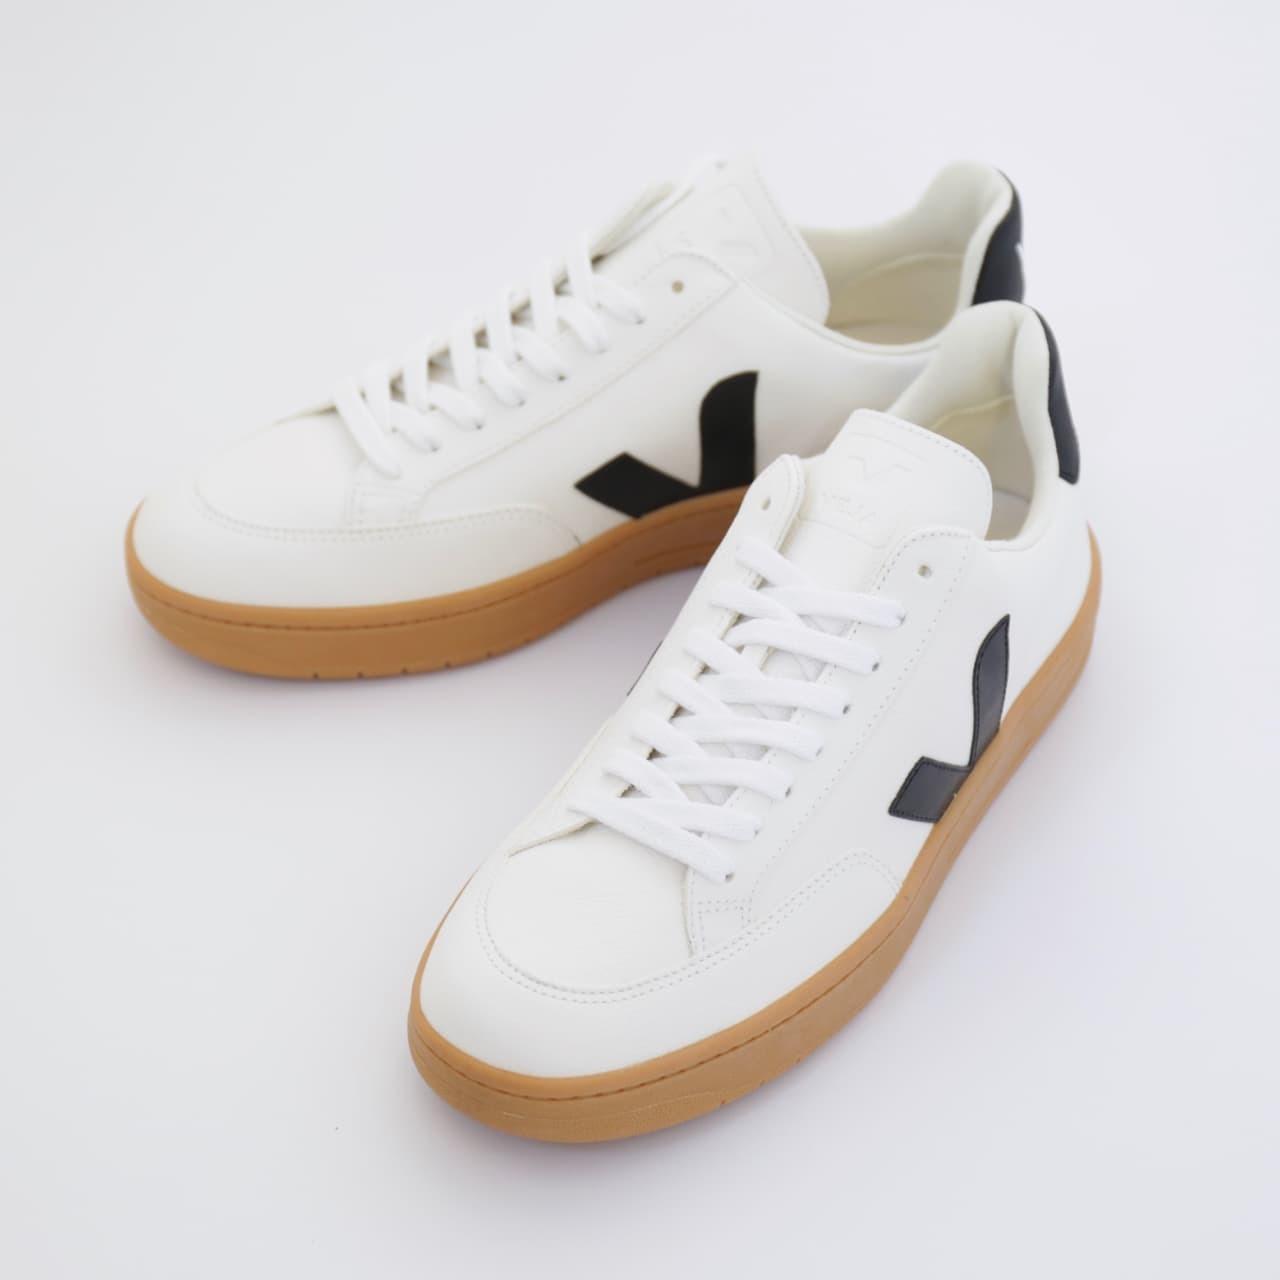 V-12 veja-sneakers-ladys-style-v-12